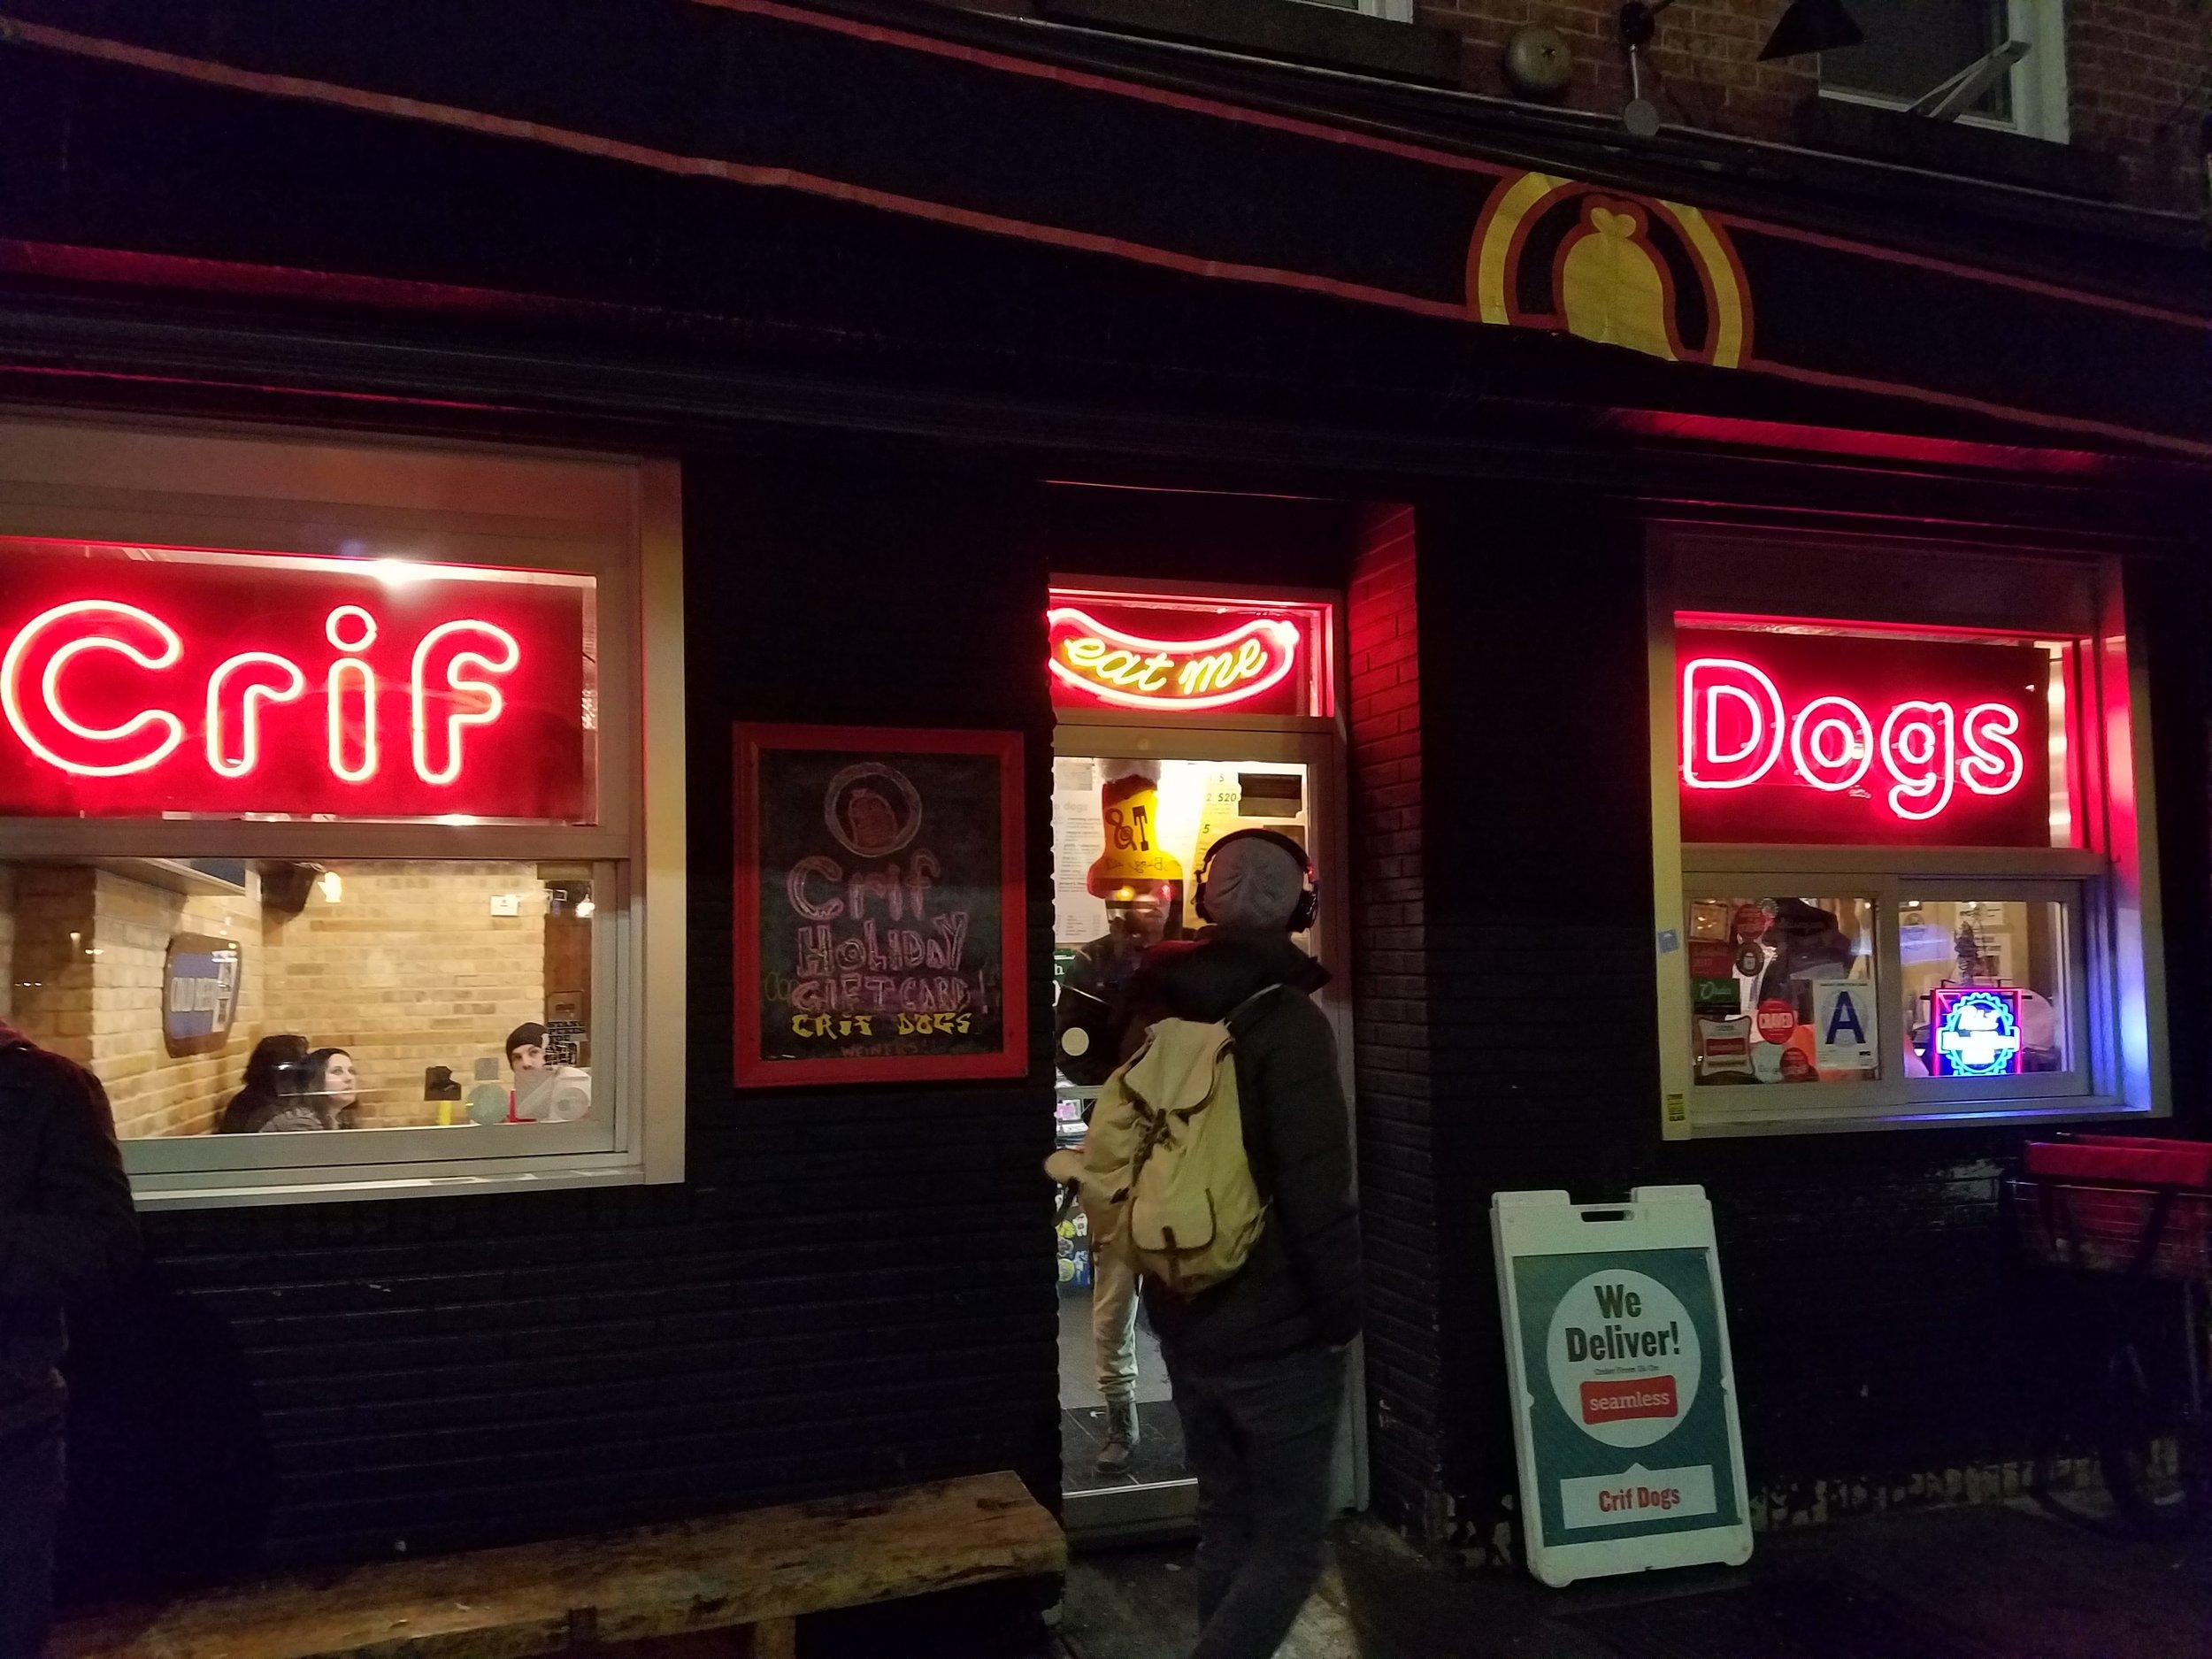 Crif Dogs on Driggs Avenue, Brooklyn, NY